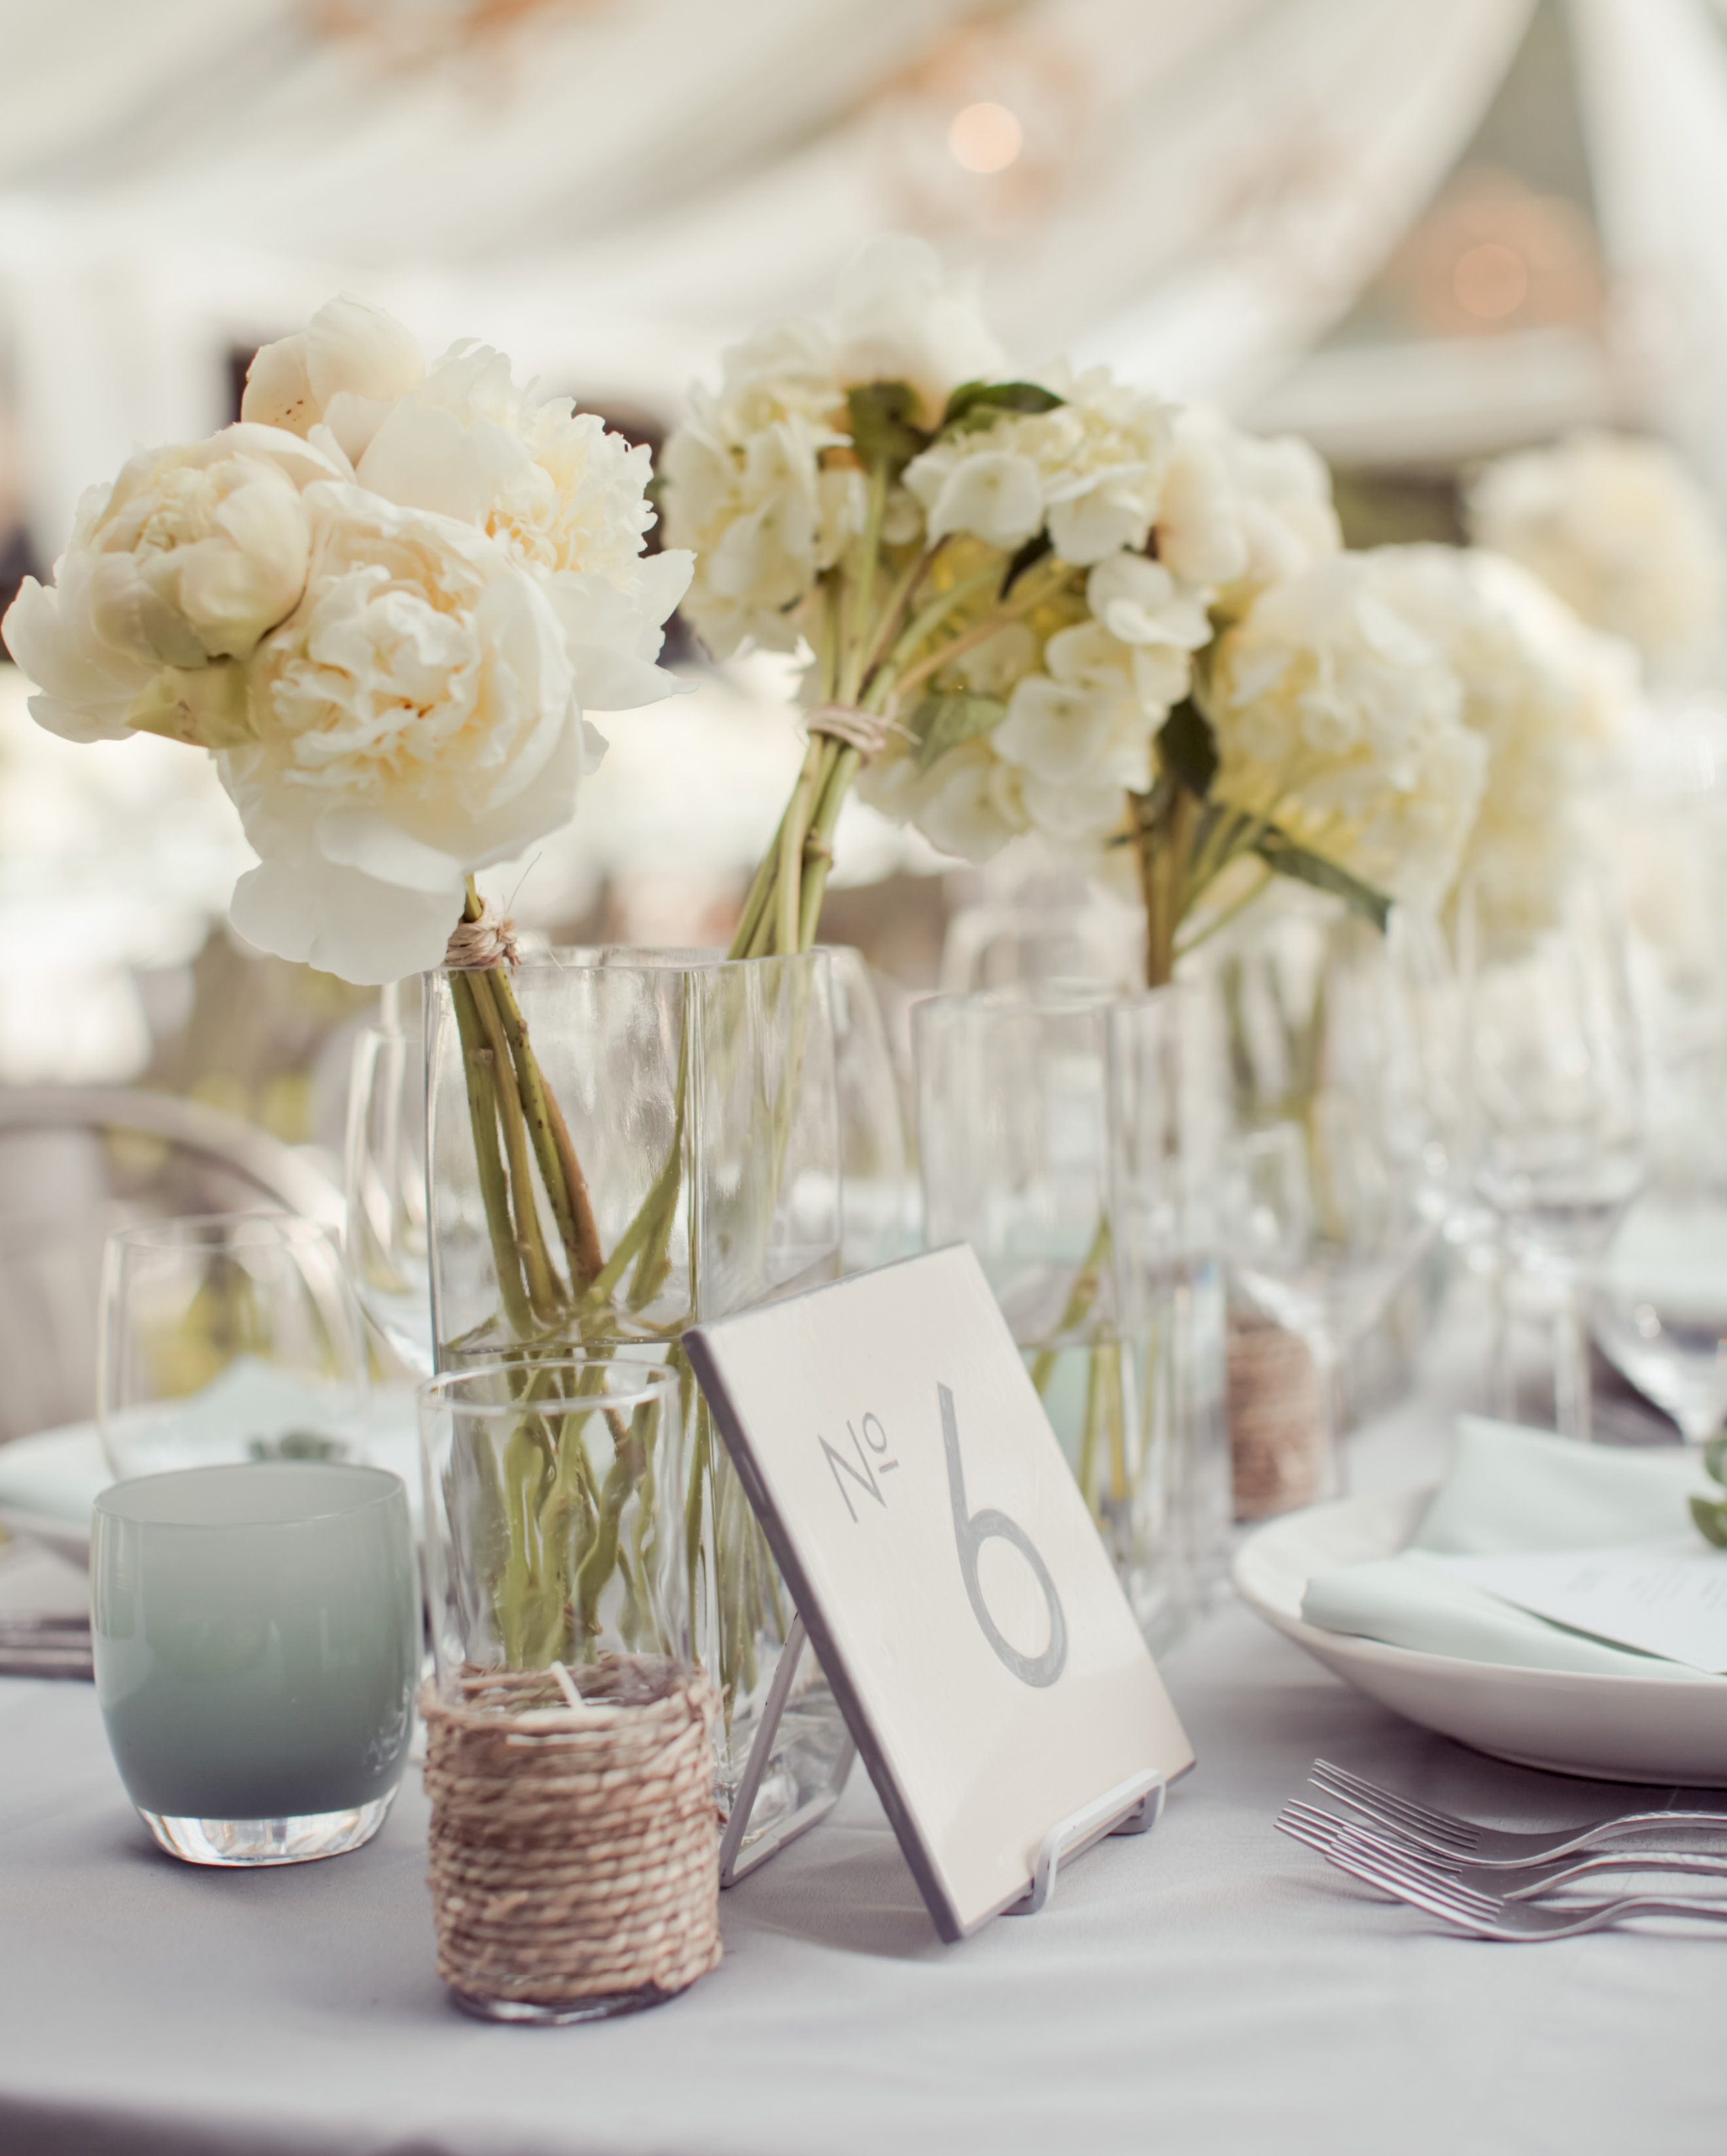 emma-michelle-wedding-tablenumber-0498-s112079-0715.jpg